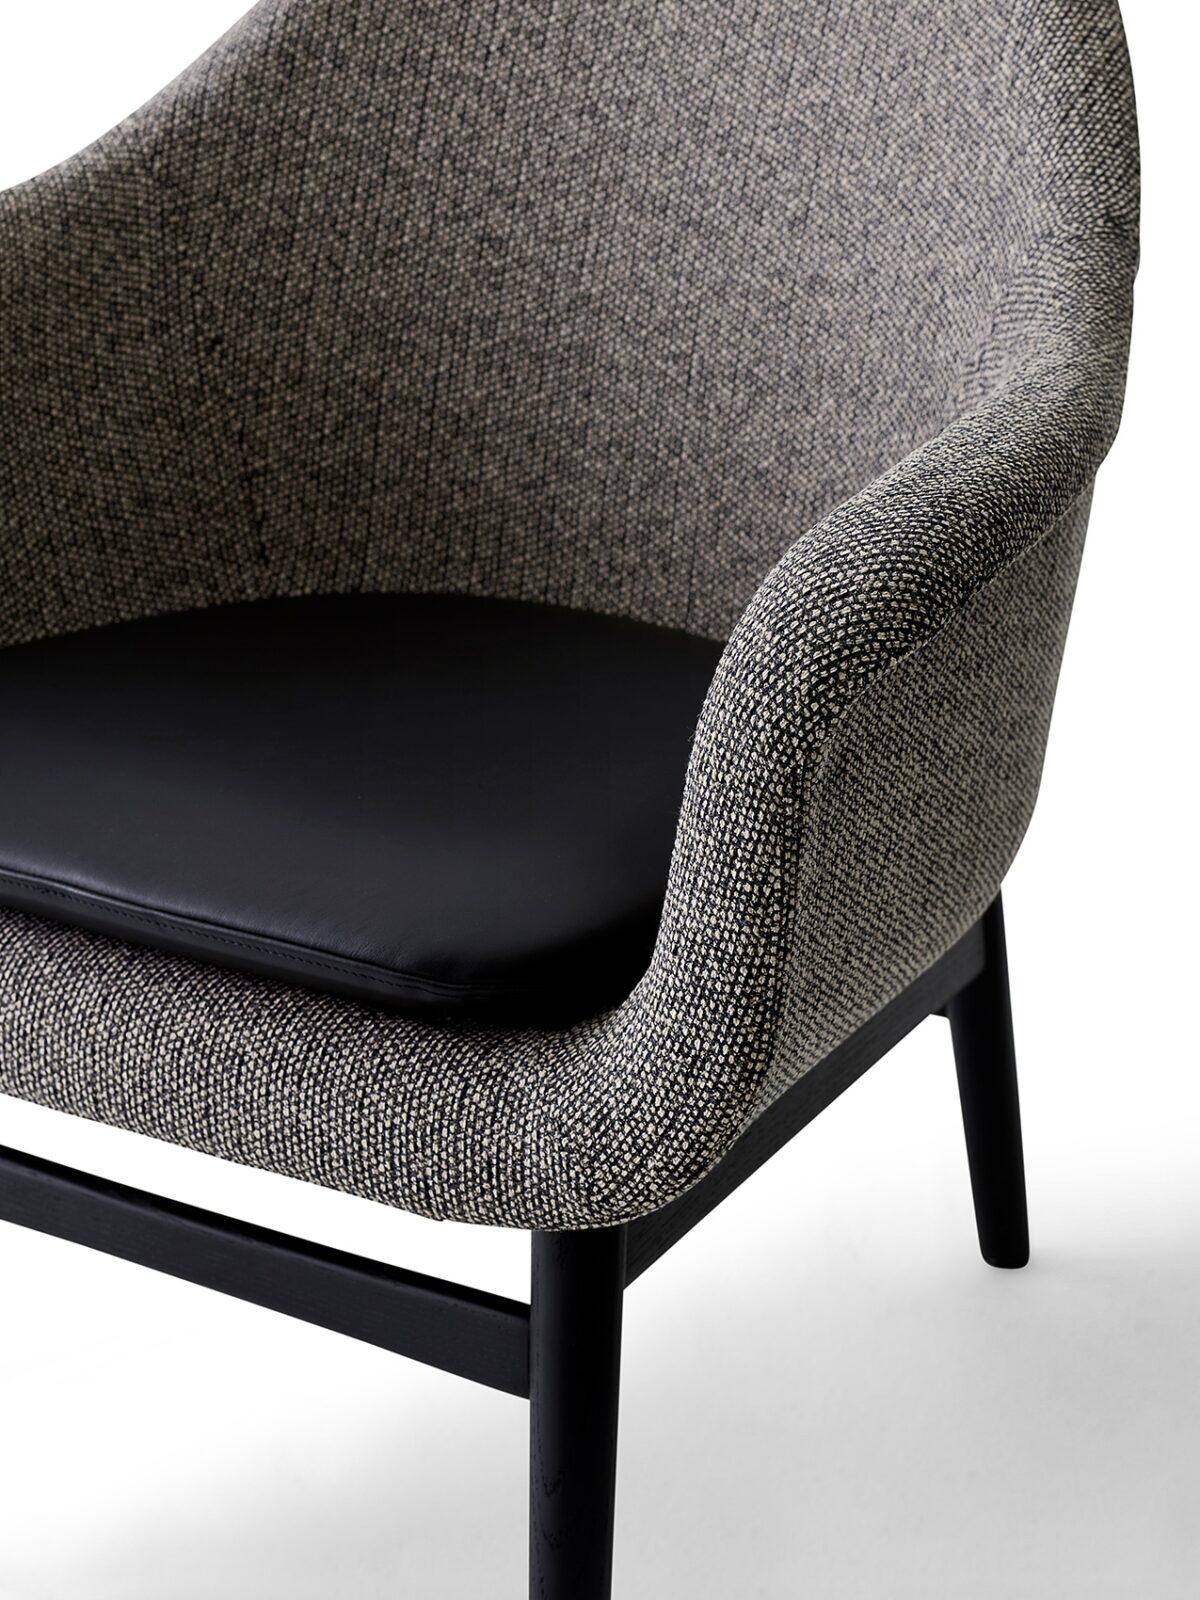 9255569 Harbour Lounge Low back Black oak Savanna 152 Shade pitch black cushion close up 1